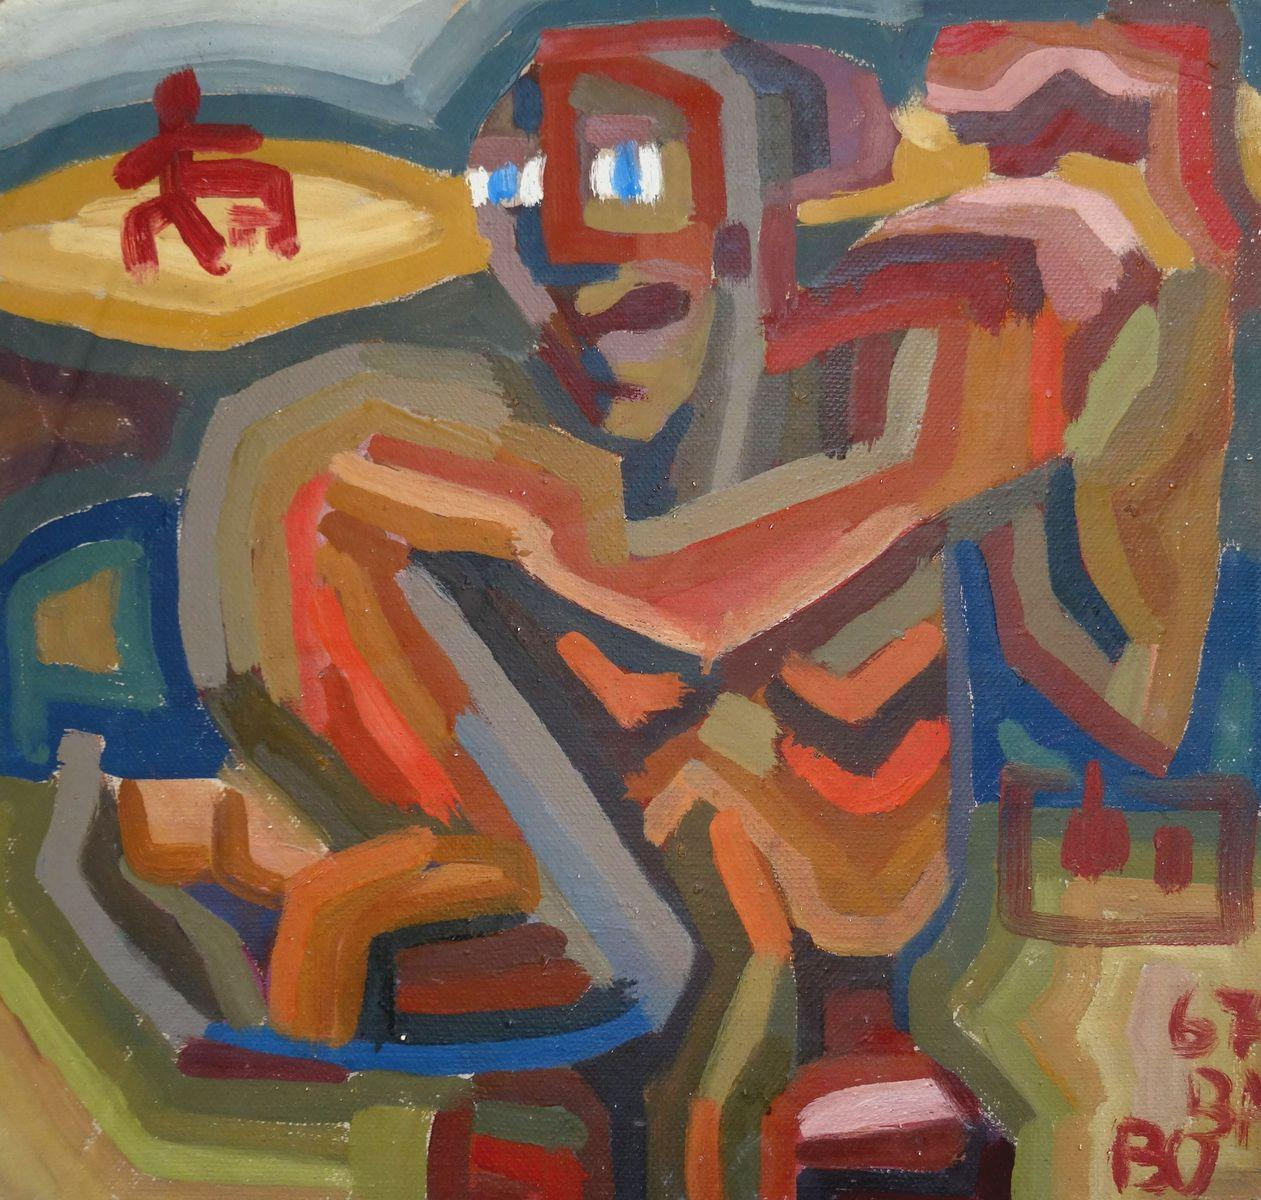 Running. 1967. Double-sided, cardboard, tempera, 37.5x39 cm